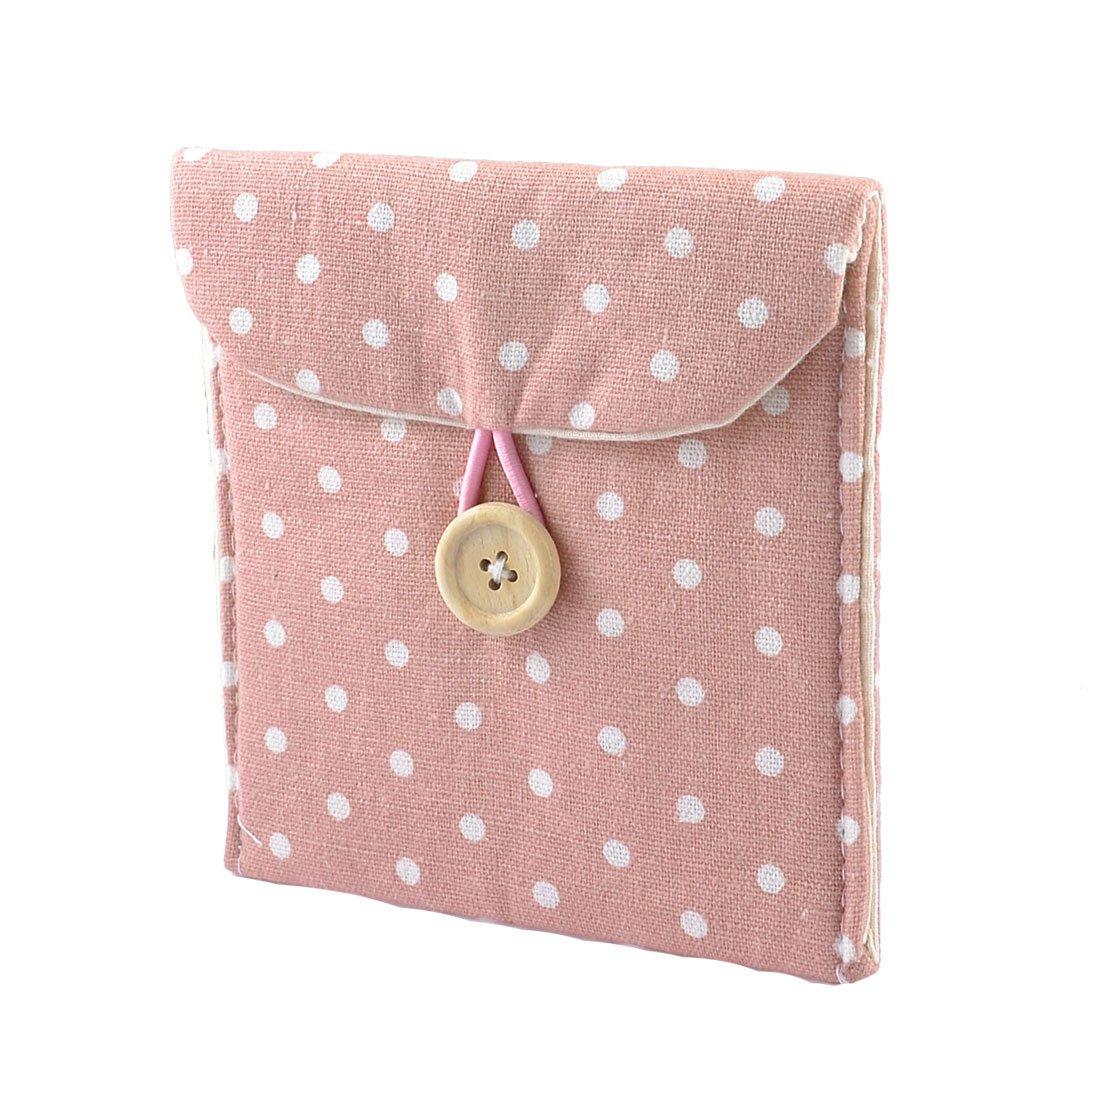 5pcs/lot Fashion! Lady Soft Cotton Blends Polka Dots Sanitary Napkins Holder Bag Pink TOOGOO(R)(China (Mainland))